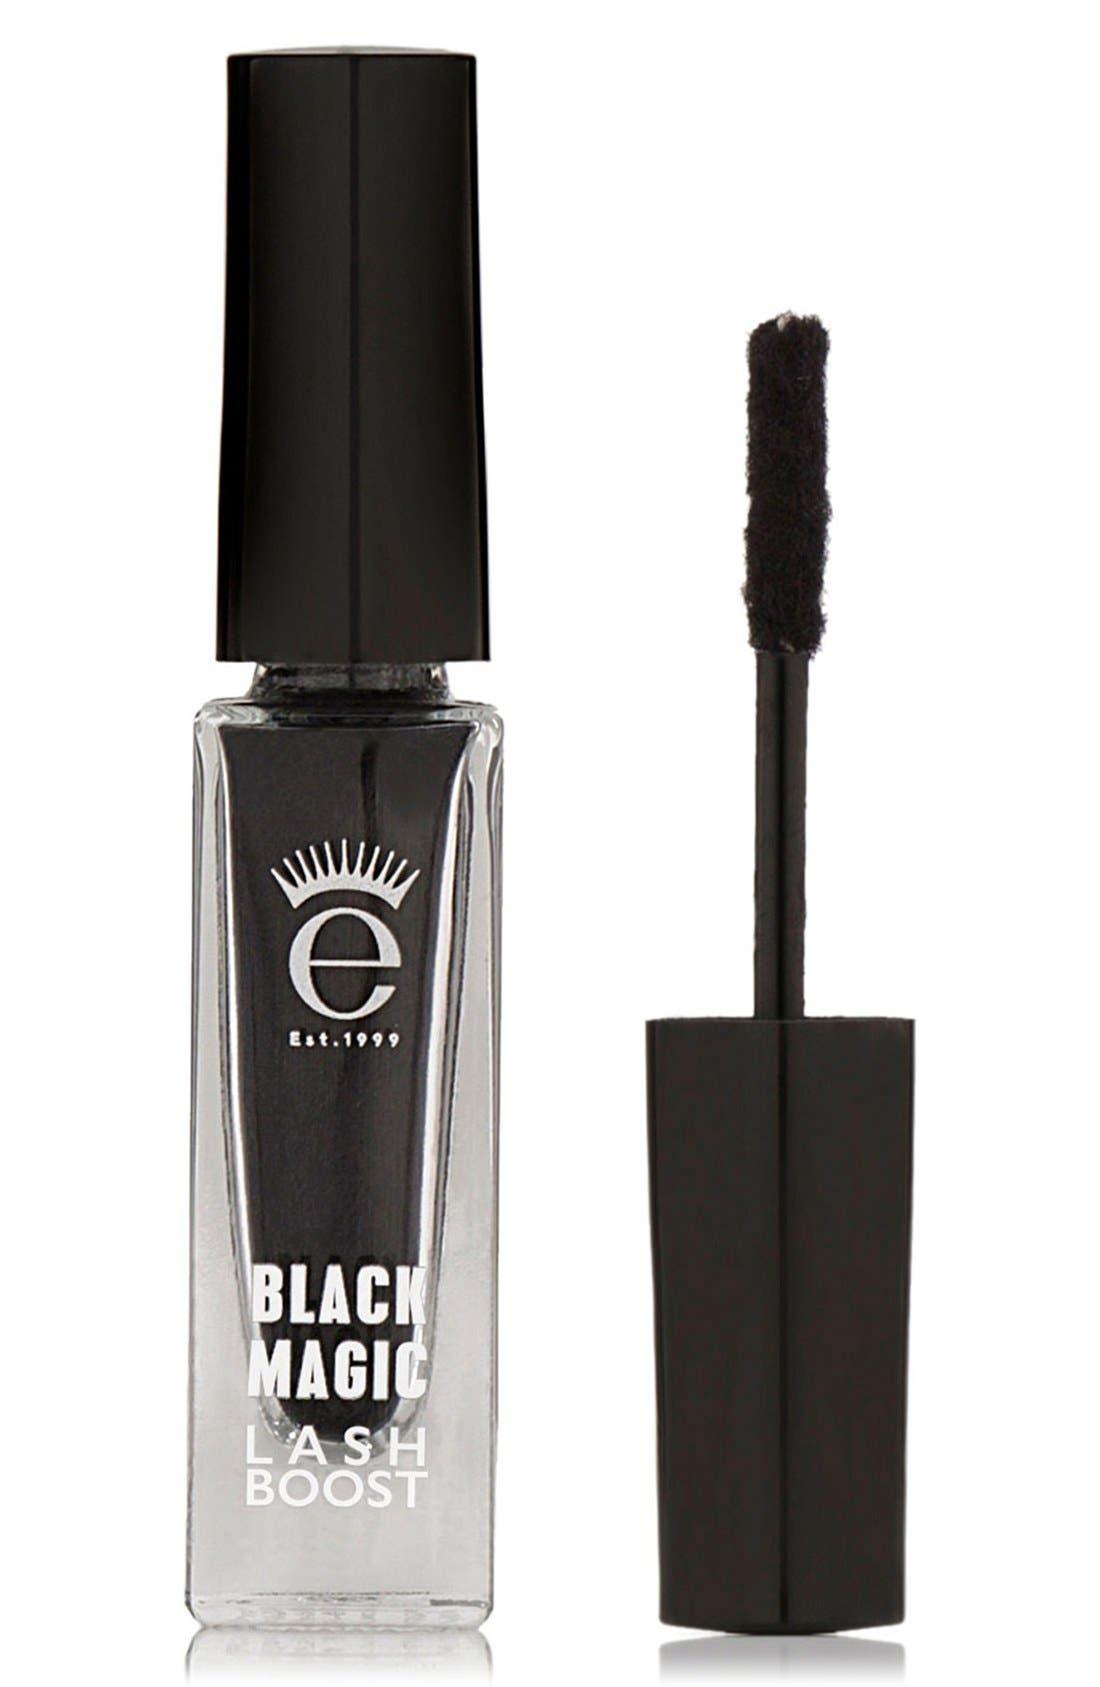 Eyeko 'Black Magic' Lash Boost Brush-On Extensions